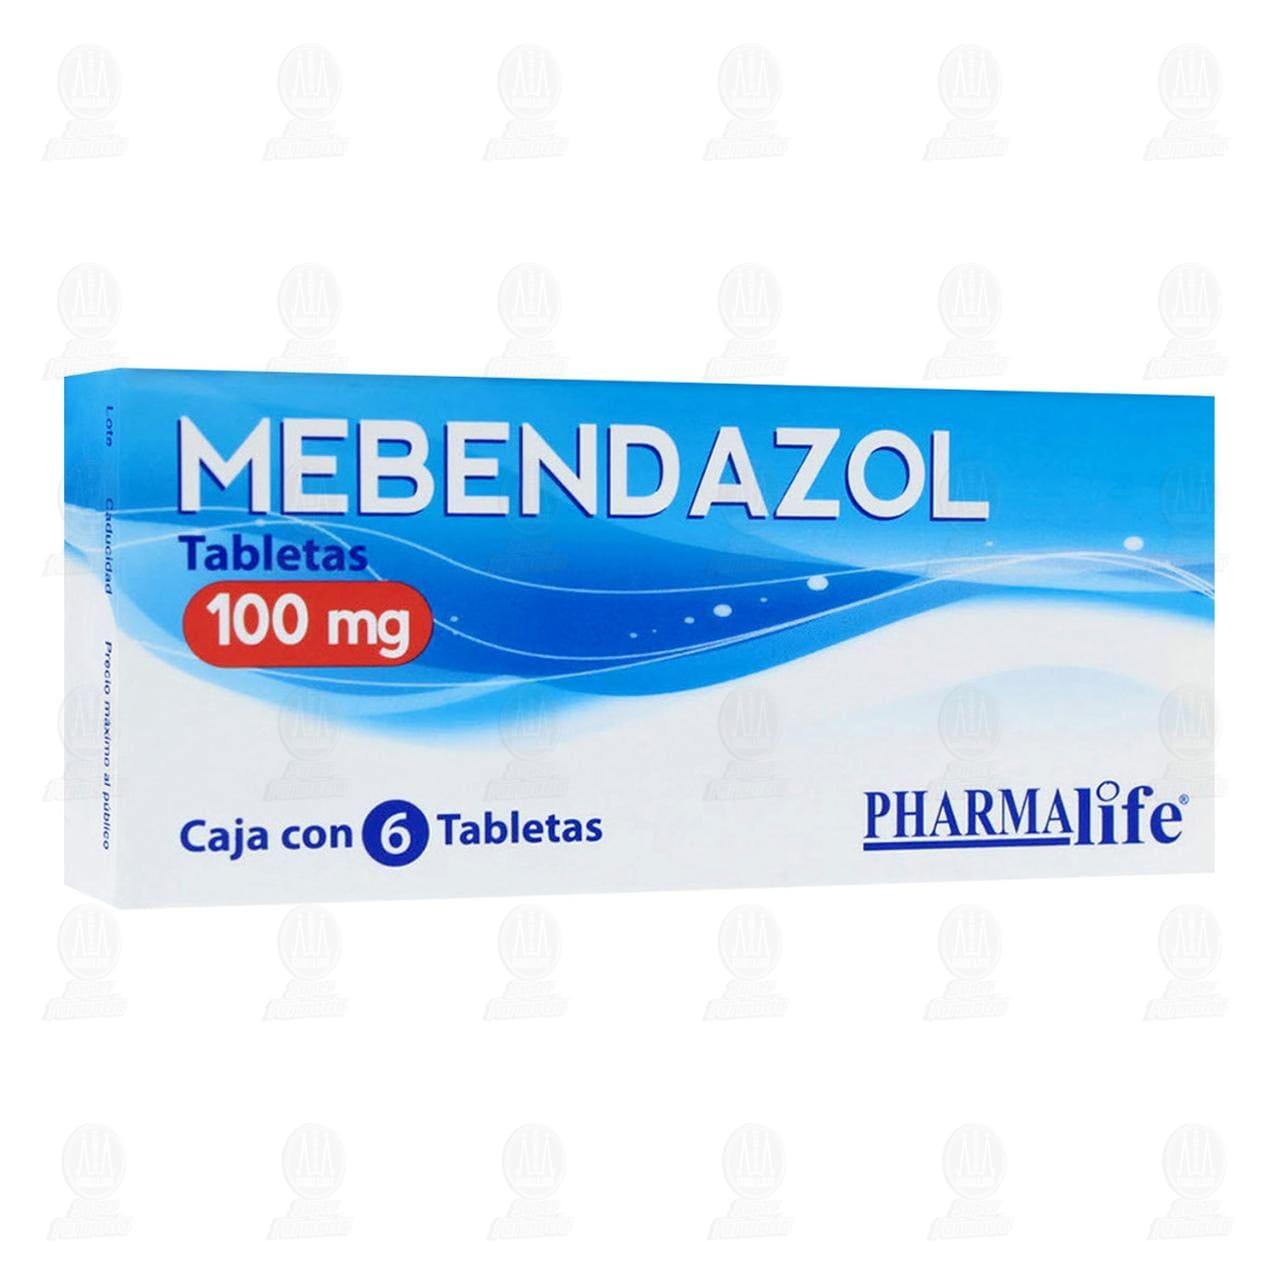 Comprar Mebendazol 100mg 6 Tabletas Pharmalife en Farmacias Guadalajara